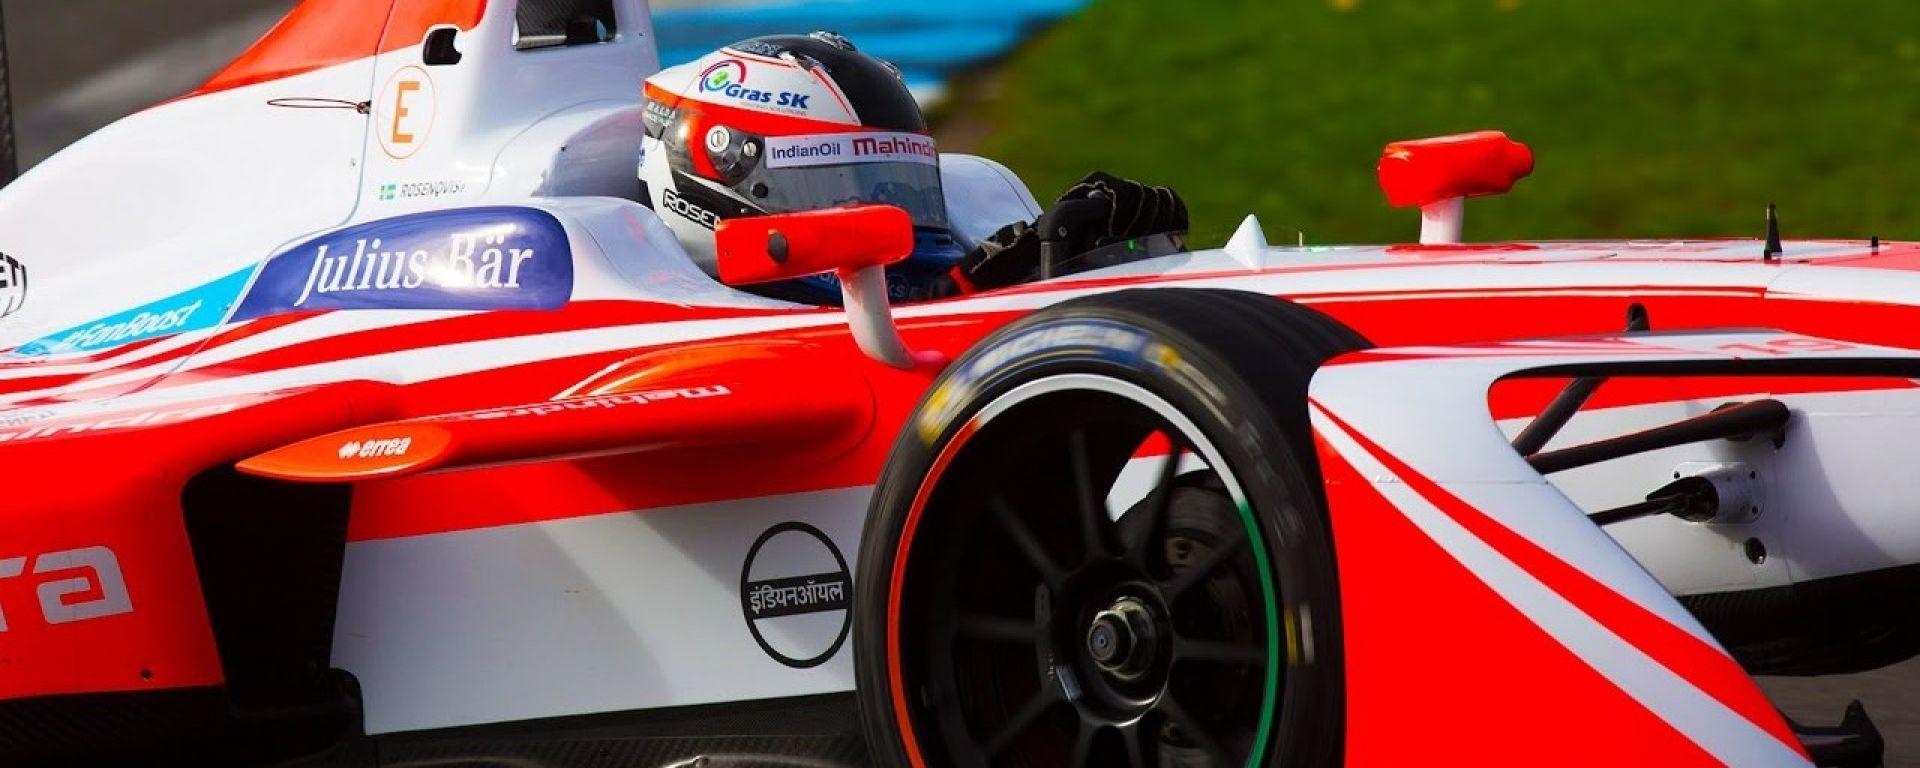 Mahindra Racing Magneti Marelli